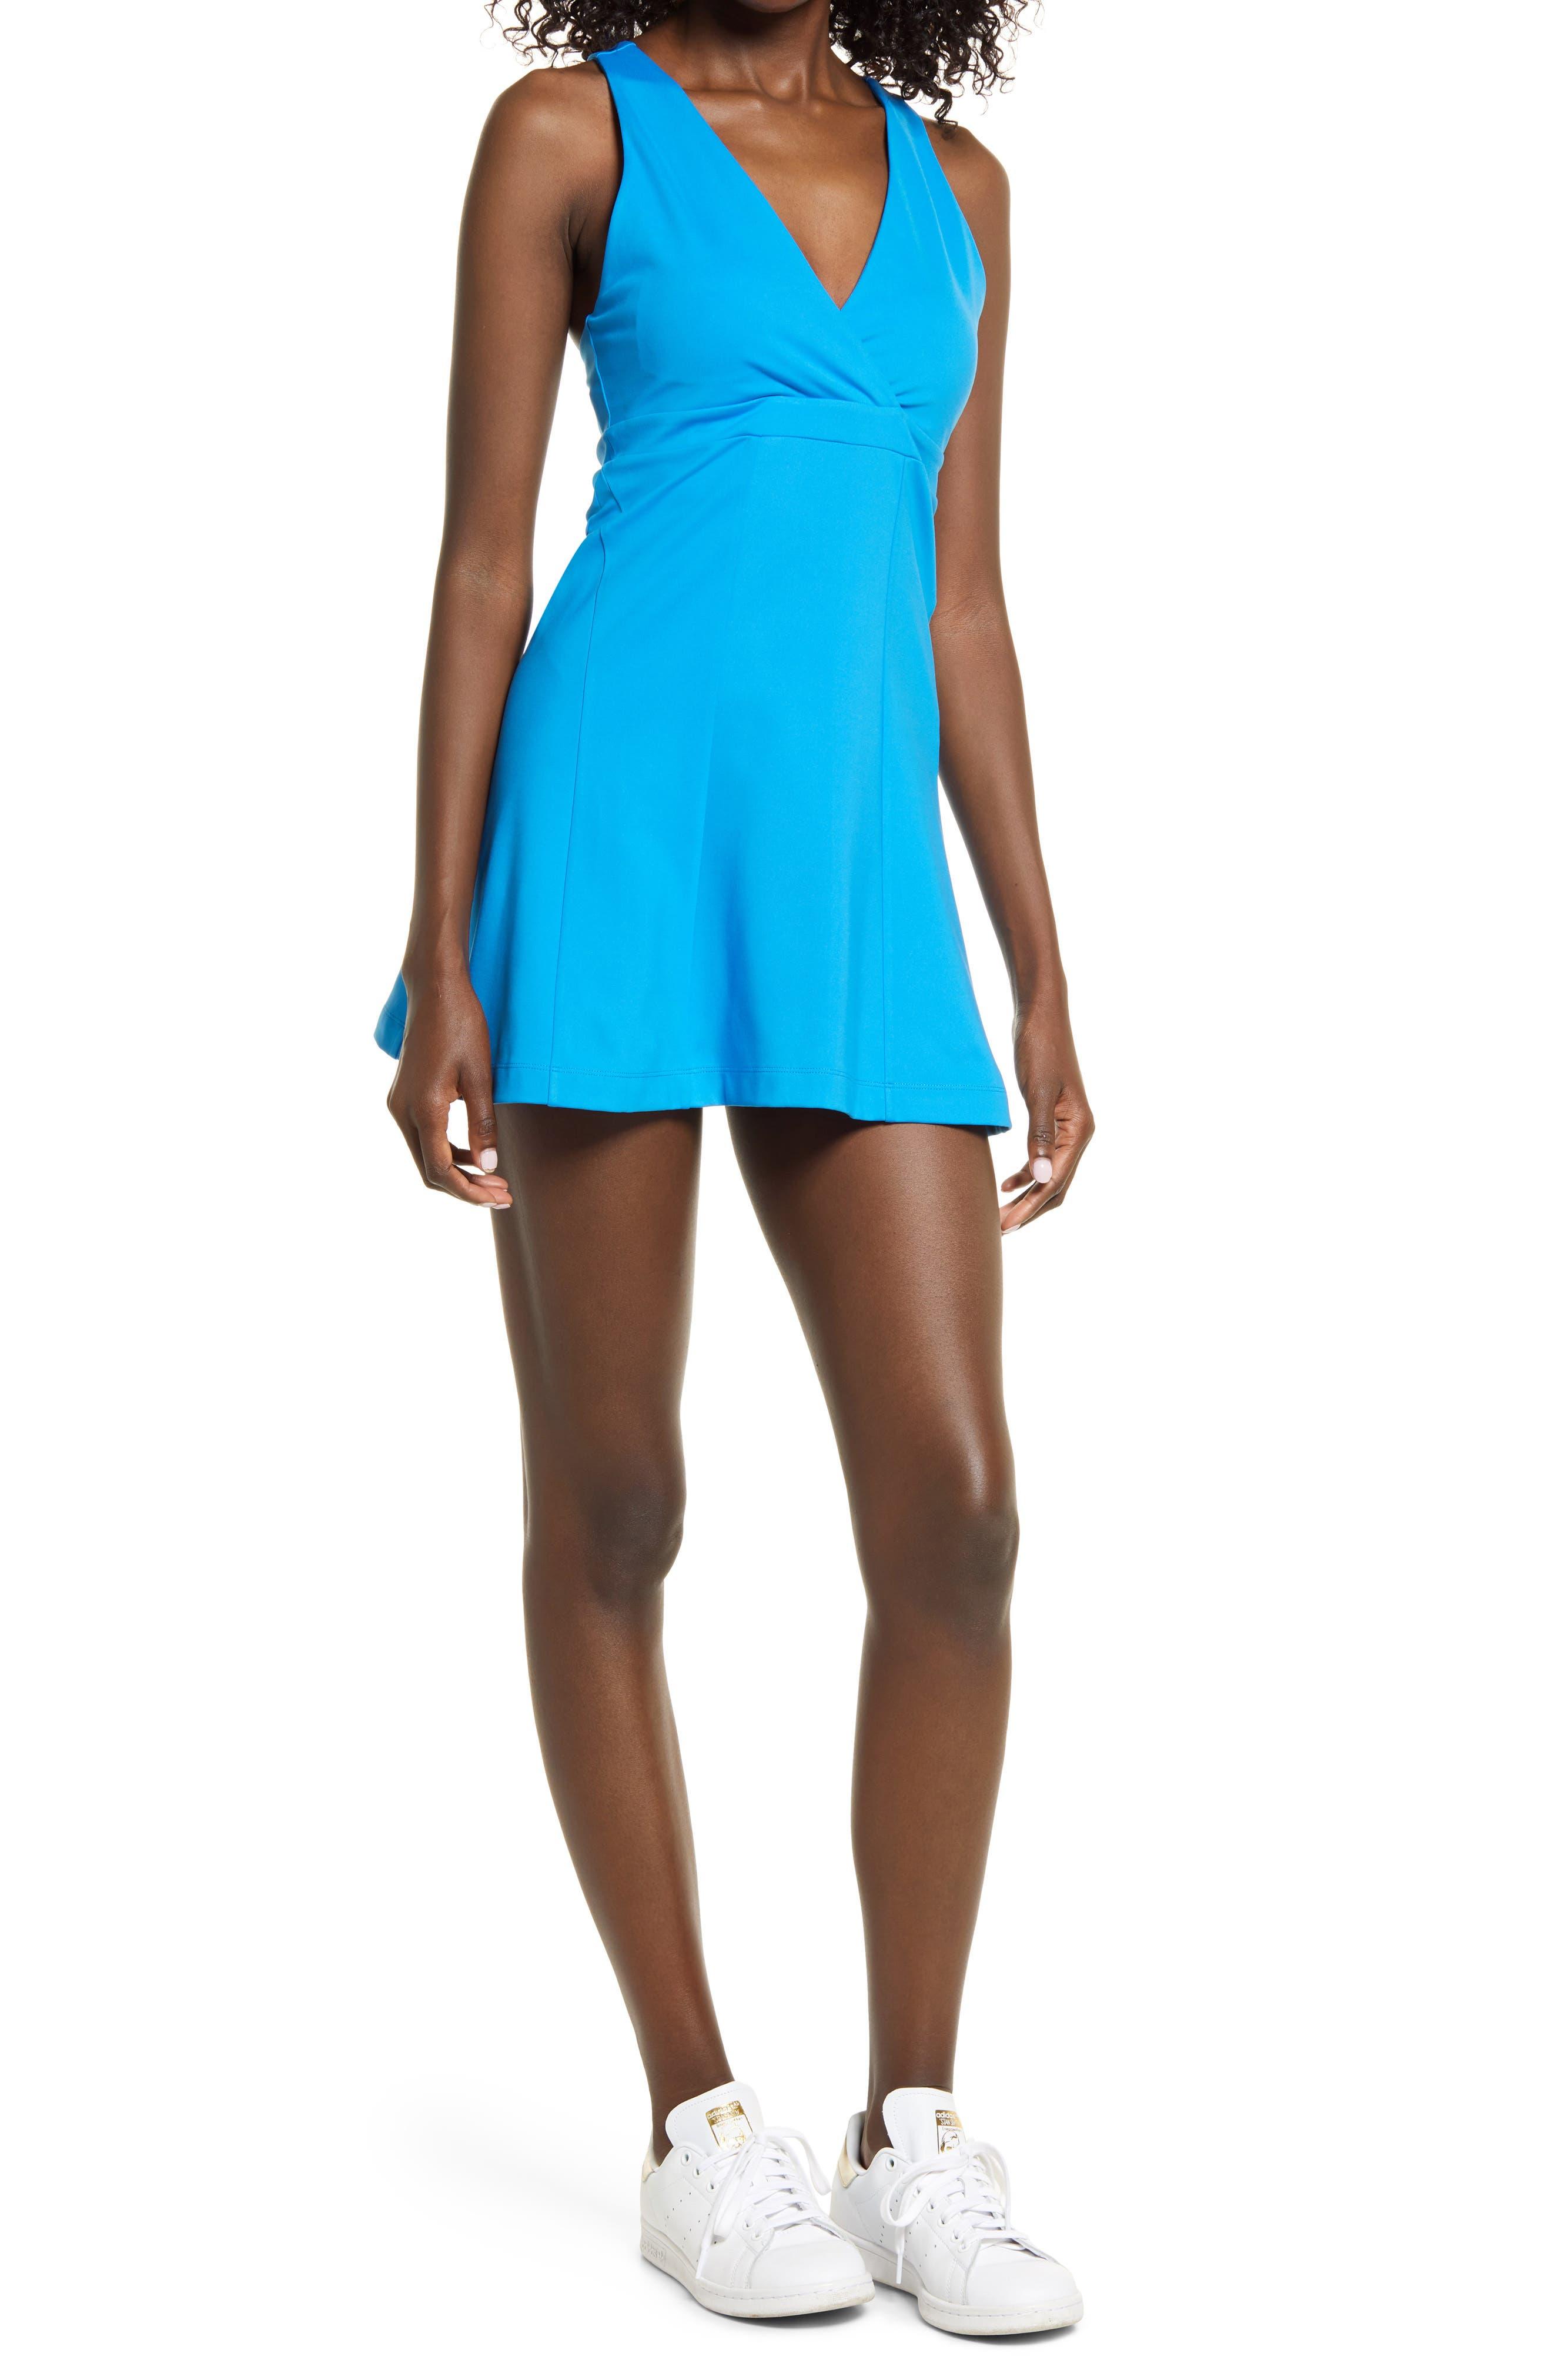 X Carbon38 Cross Back Tennis Dress